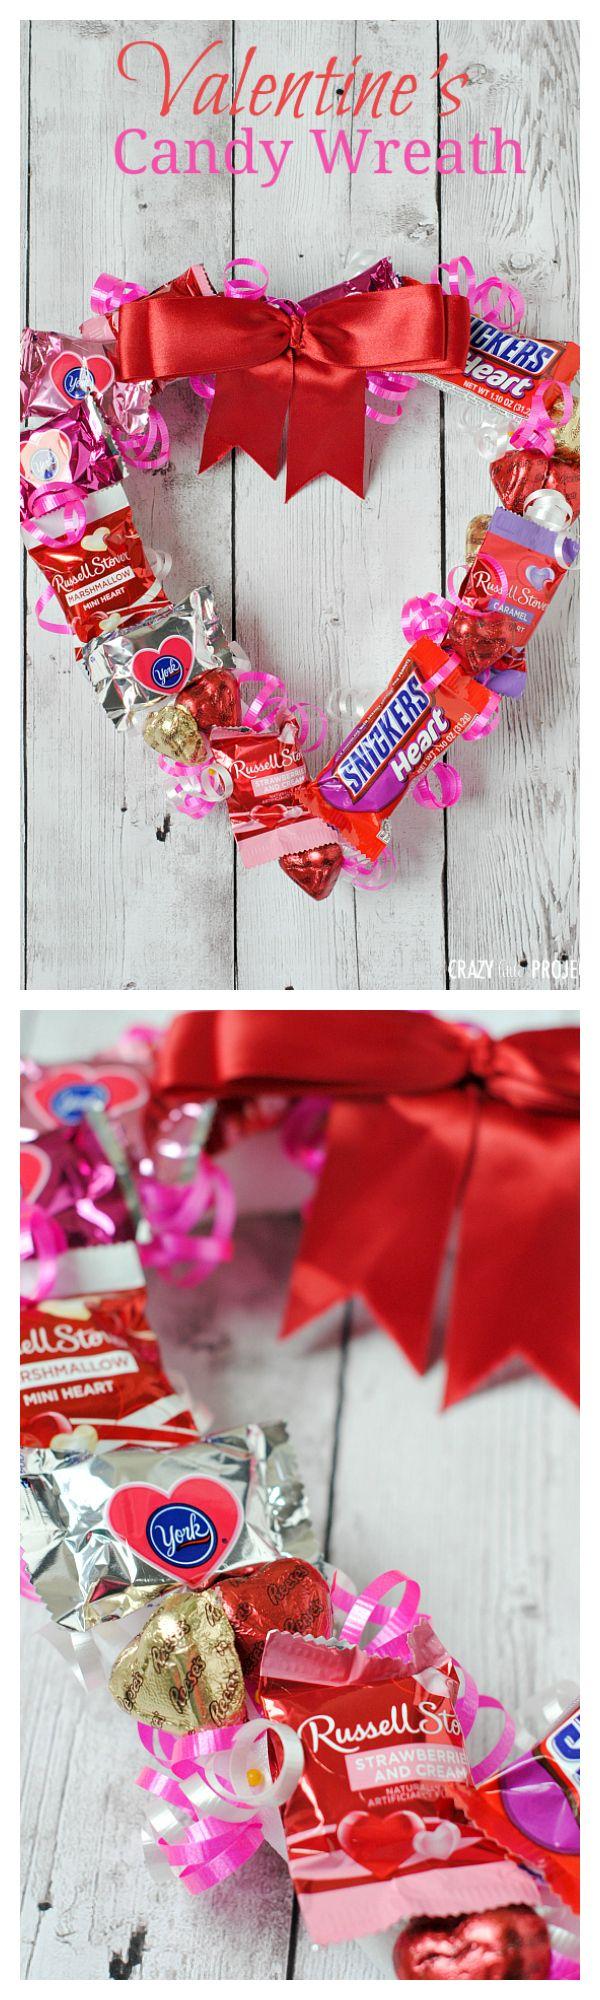 Cute Gift Idea for Valentineu0027s Candy Wreath